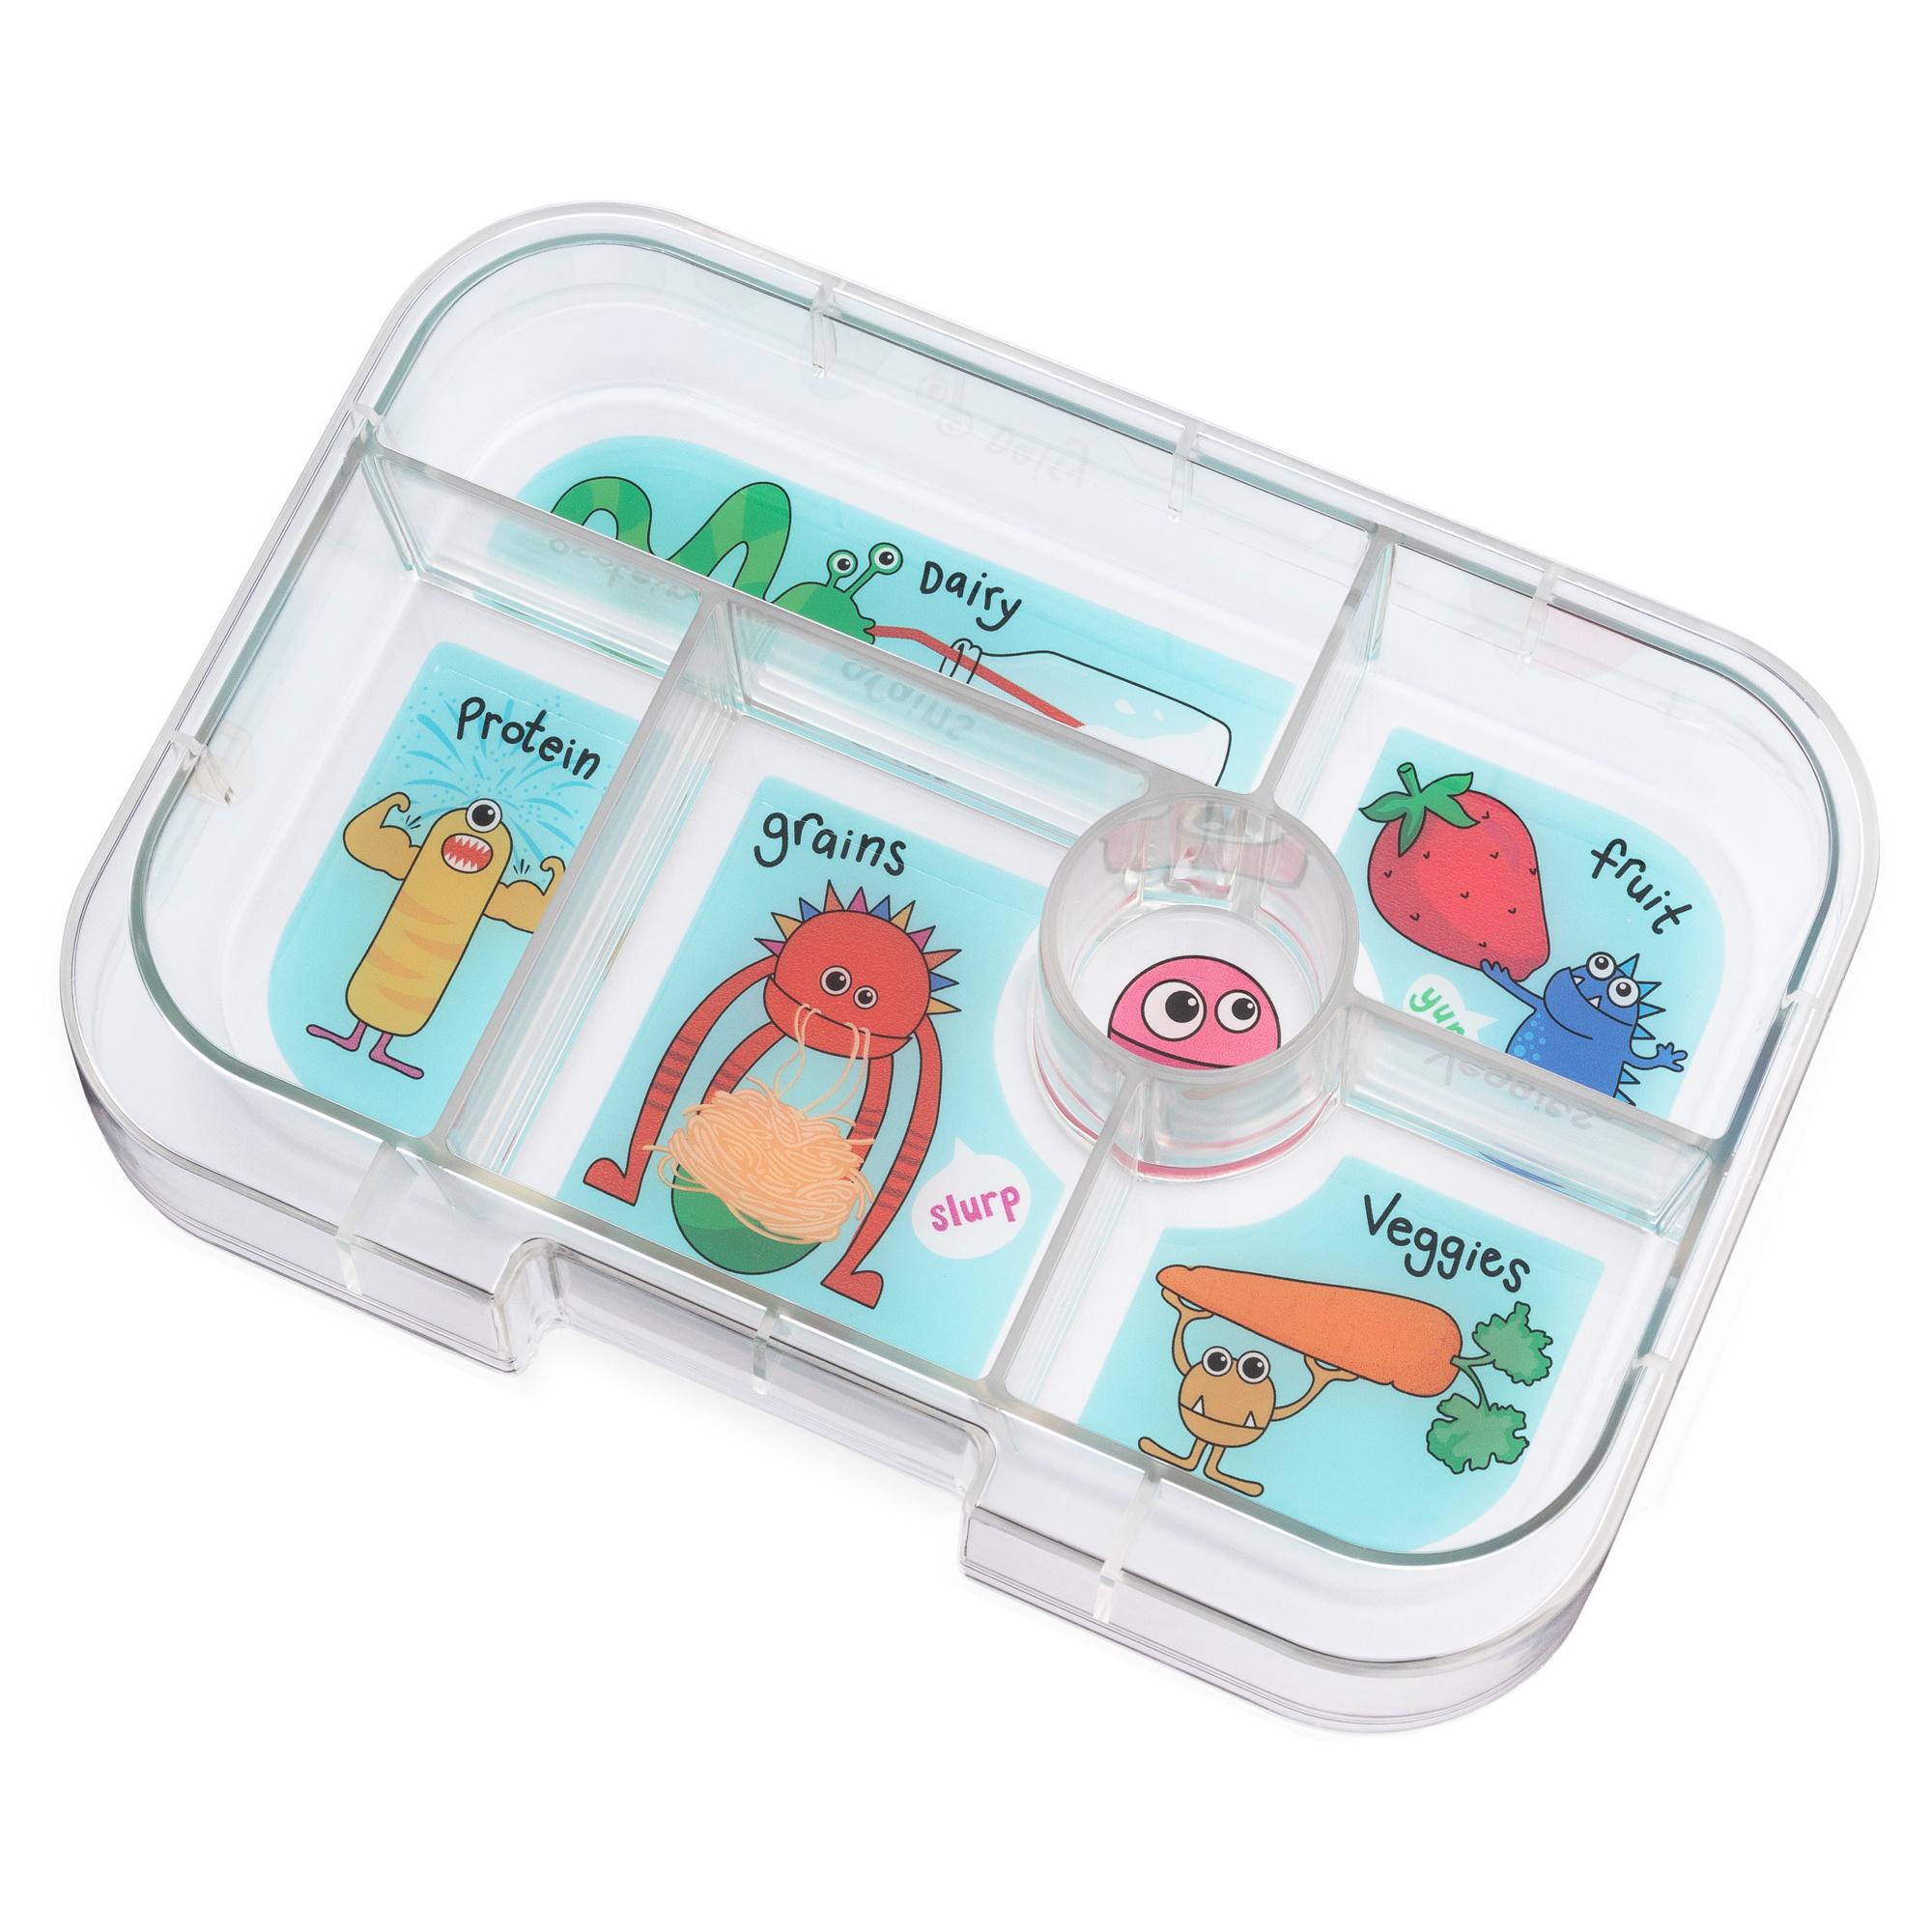 Yumbox Original extra tray 6-vakken Funny Monsters-1